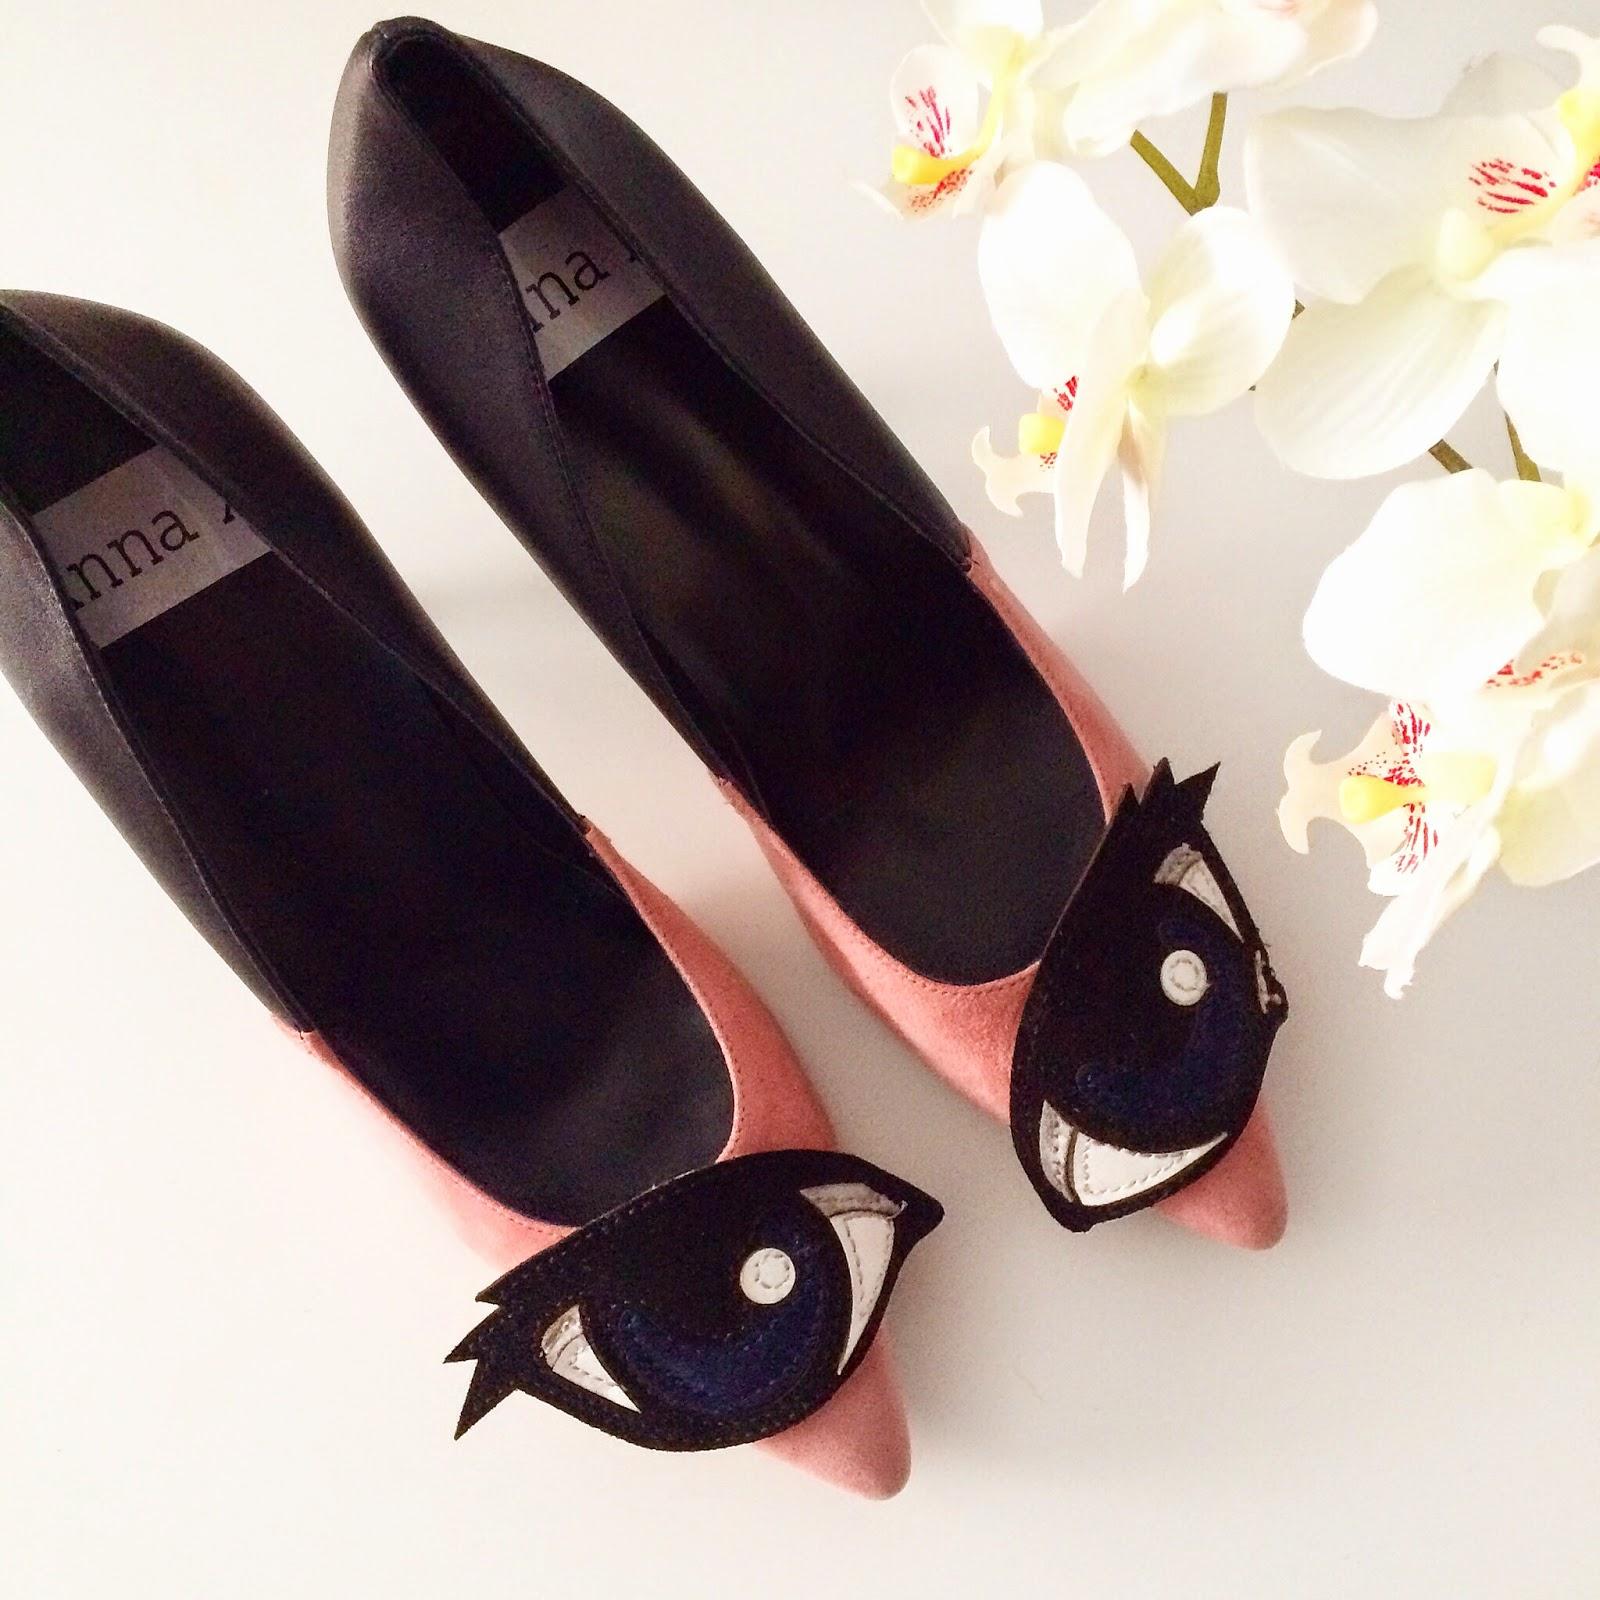 Anna Xi Eye Heels, Fun Heels, Heels, Pink Heels, Eyes On Me Heels